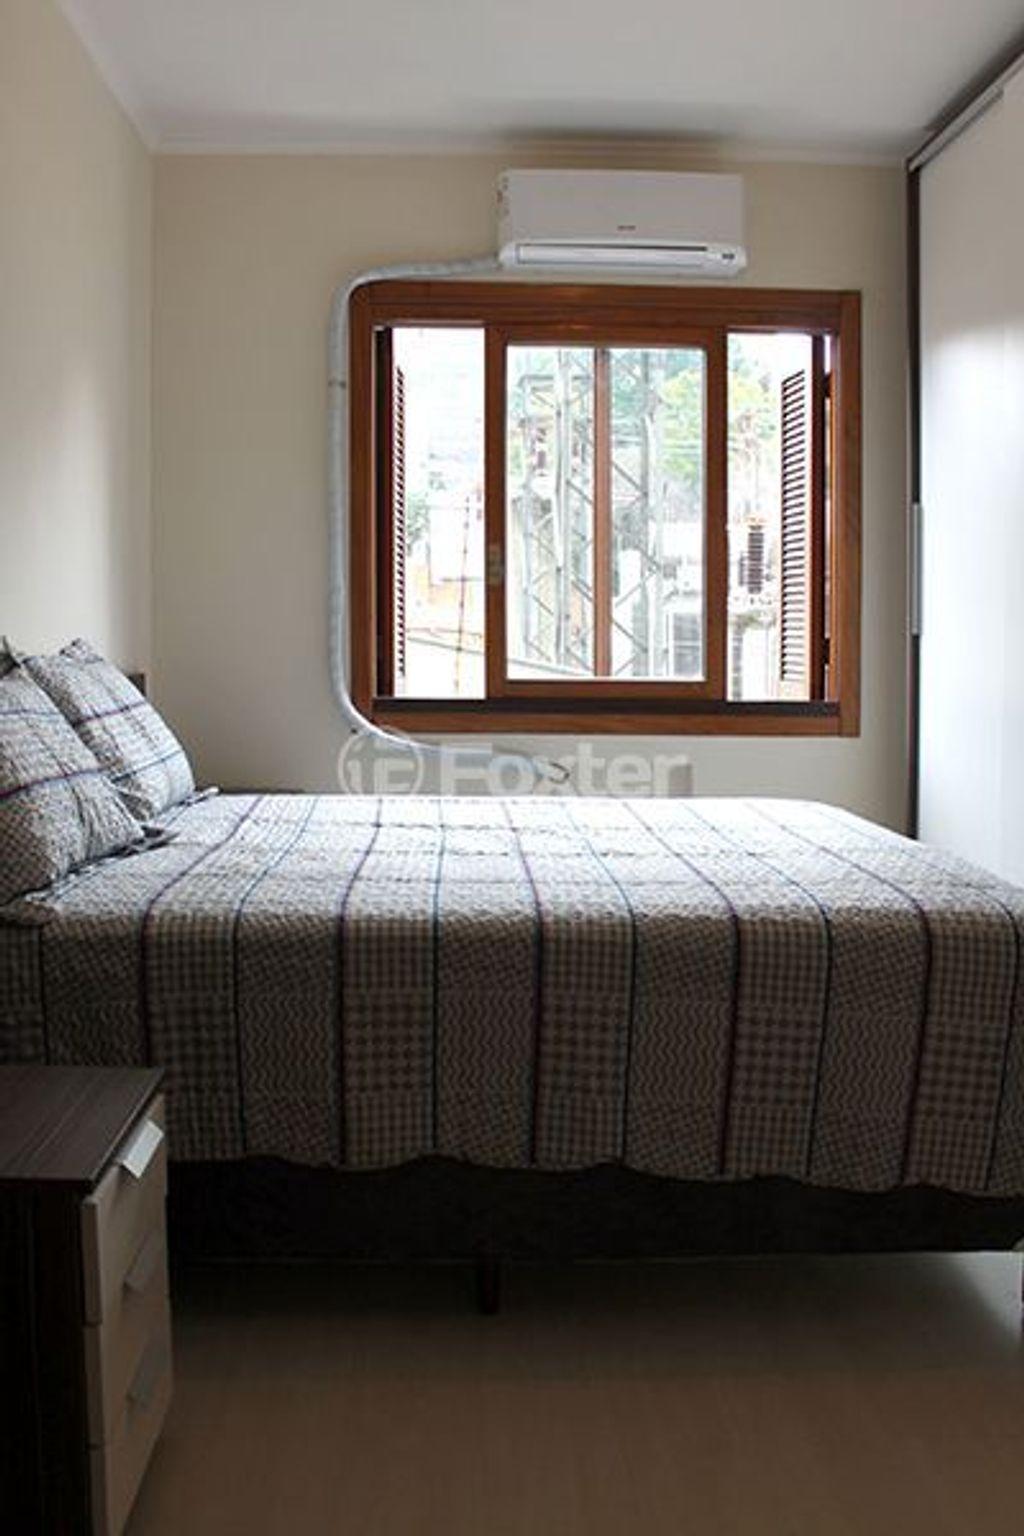 Apto 2 Dorm, Petrópolis, Porto Alegre (145742) - Foto 21